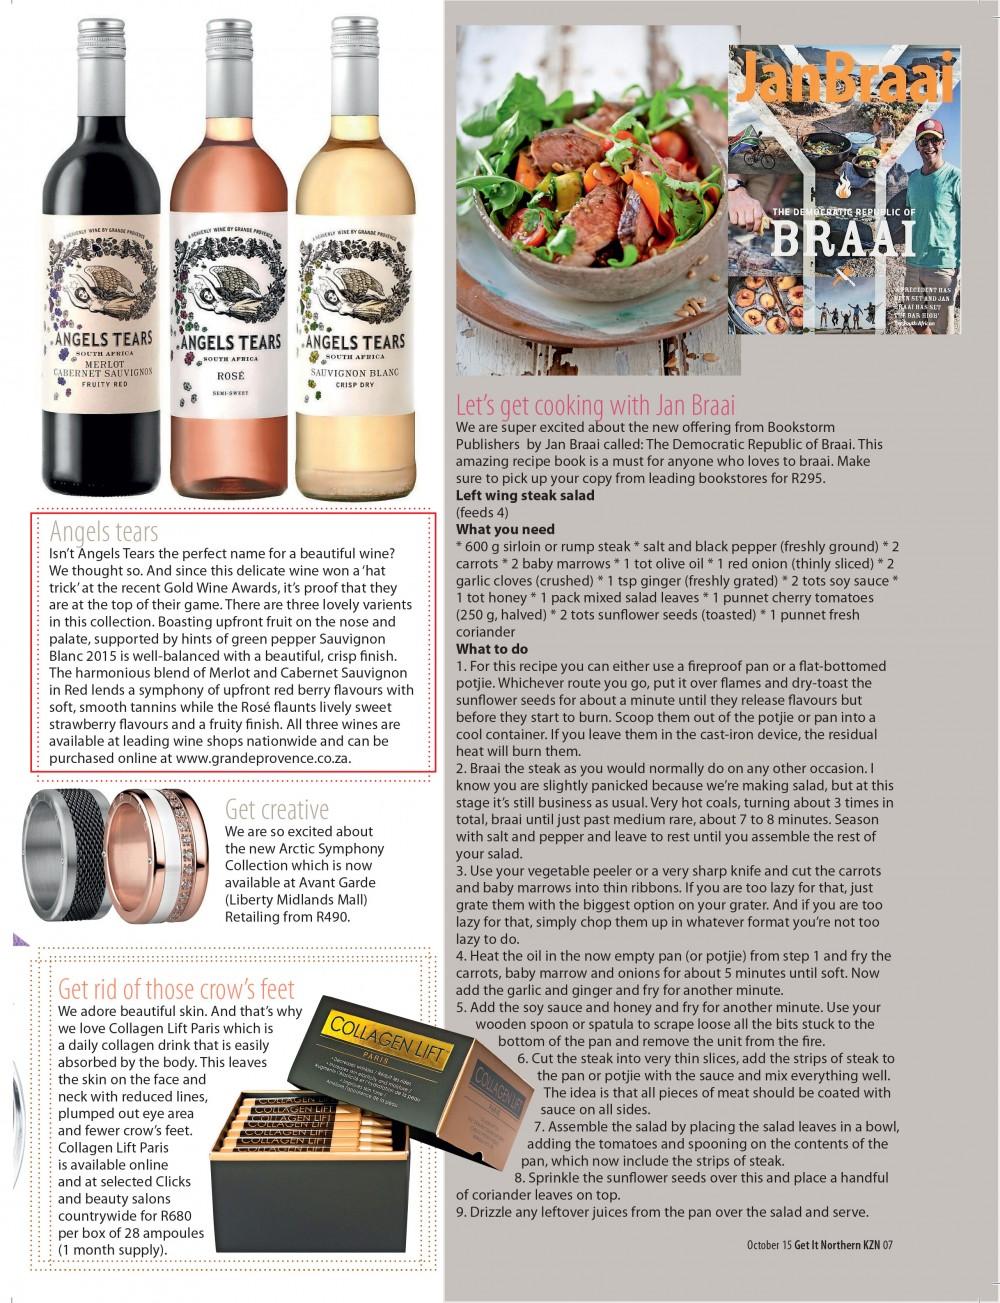 Media Release | Collagen Lift Paris